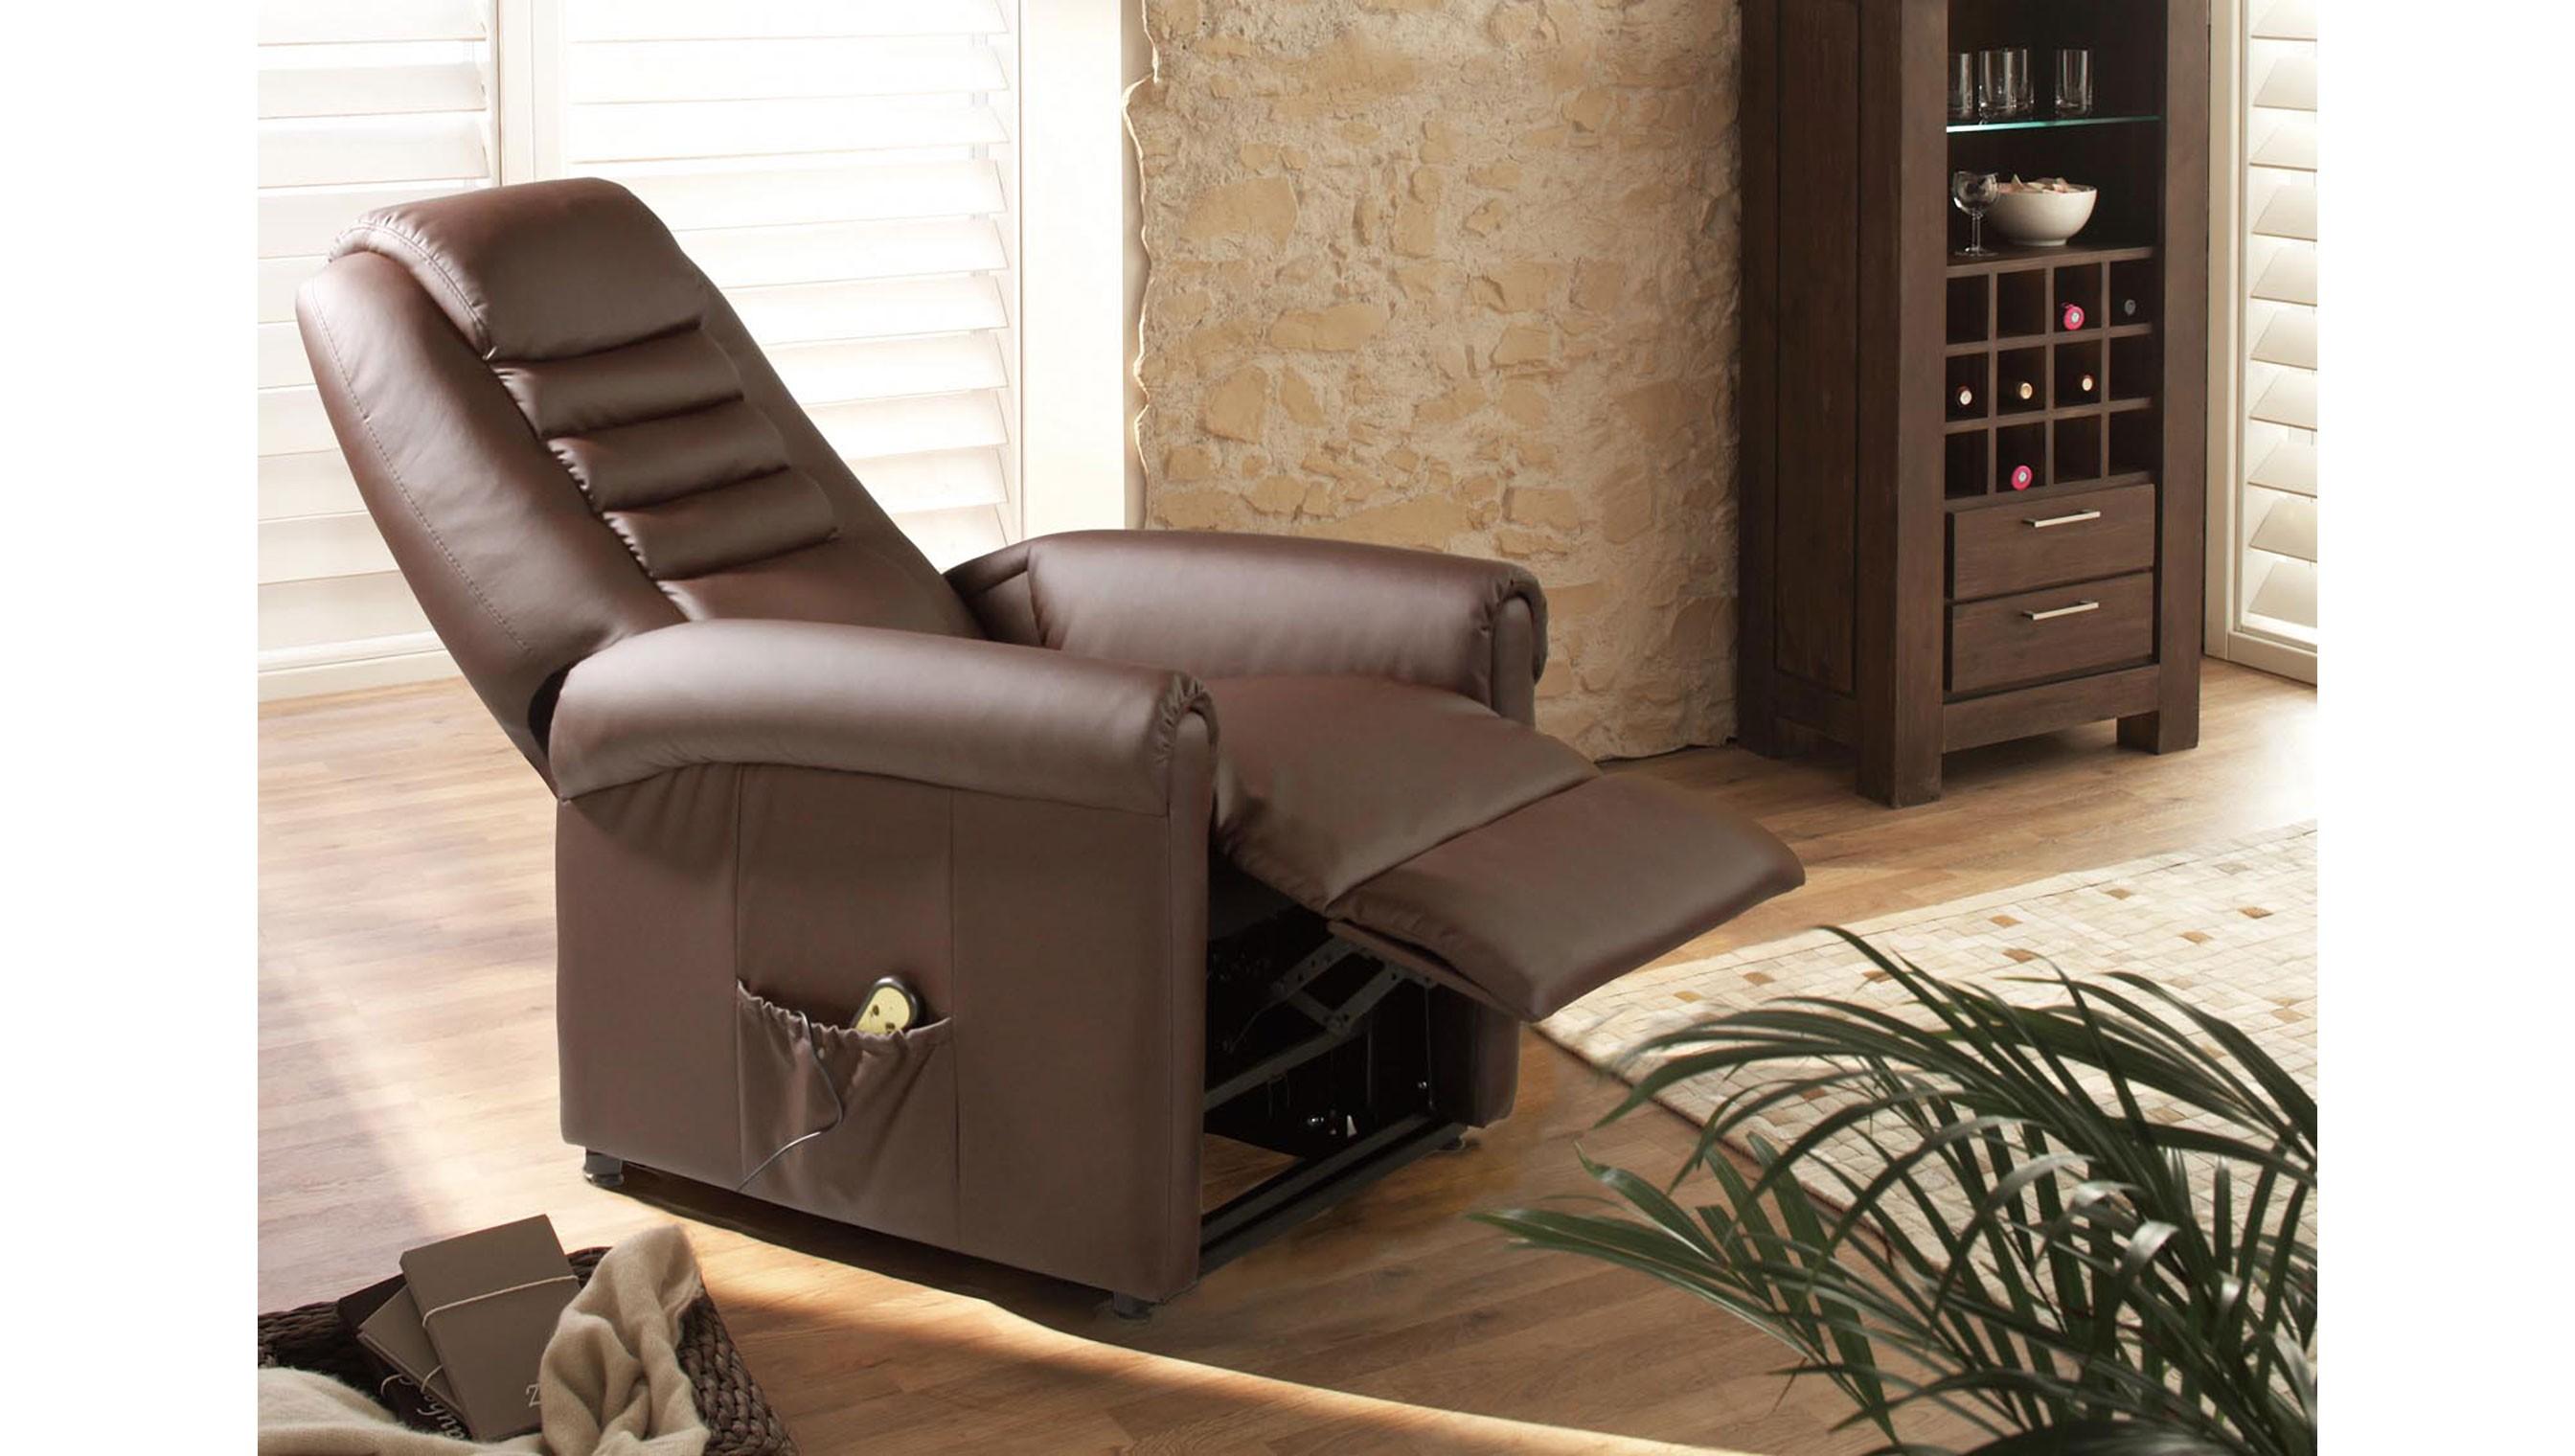 lehnstuhl elektrisch shqiptoolbar. Black Bedroom Furniture Sets. Home Design Ideas